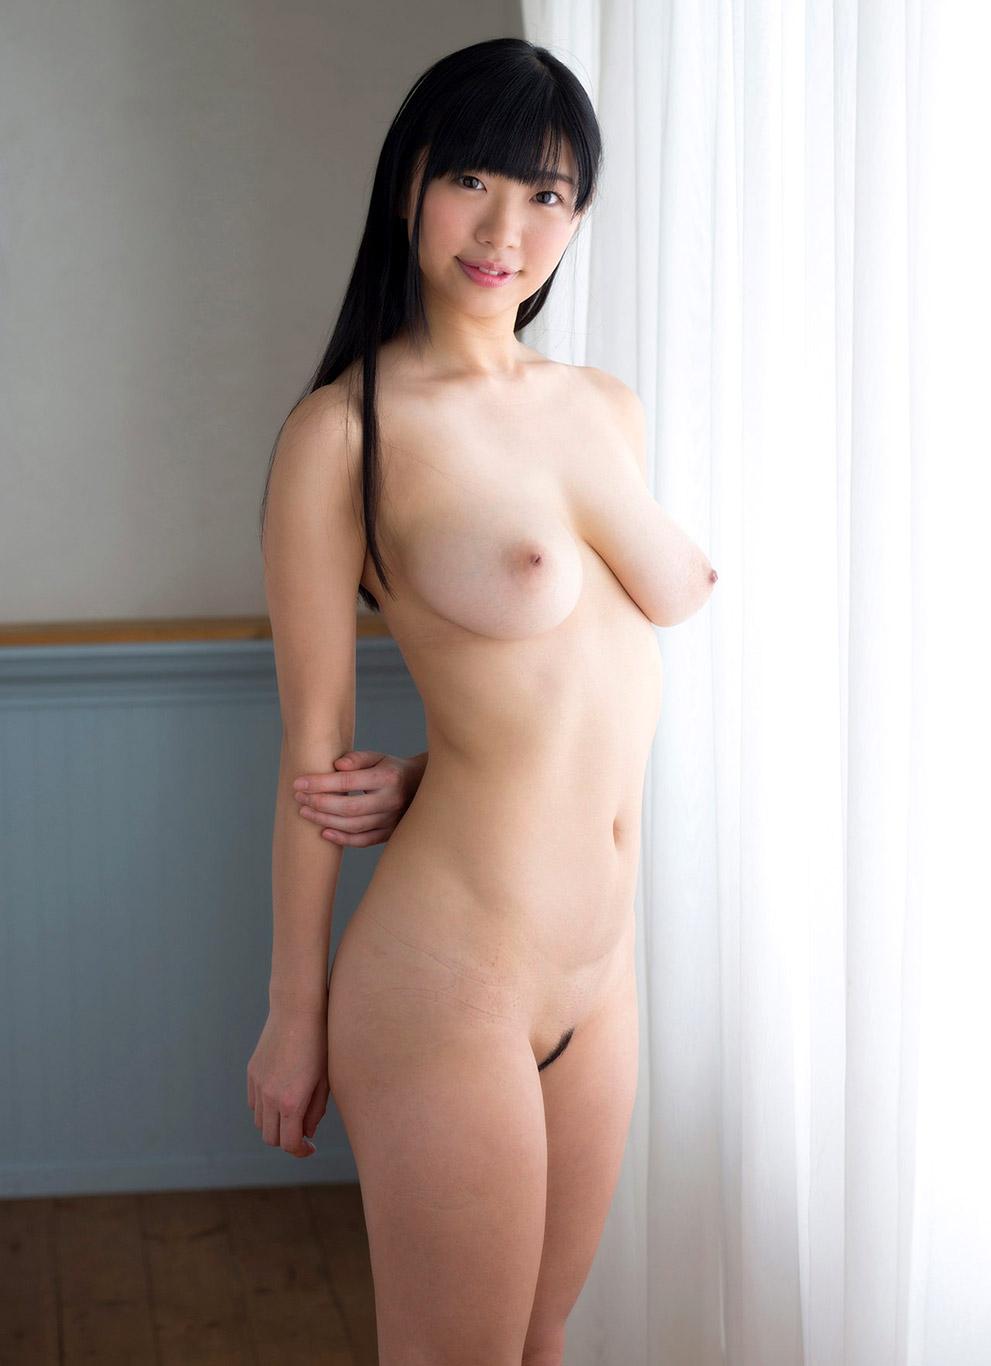 porn 3gp mobile free